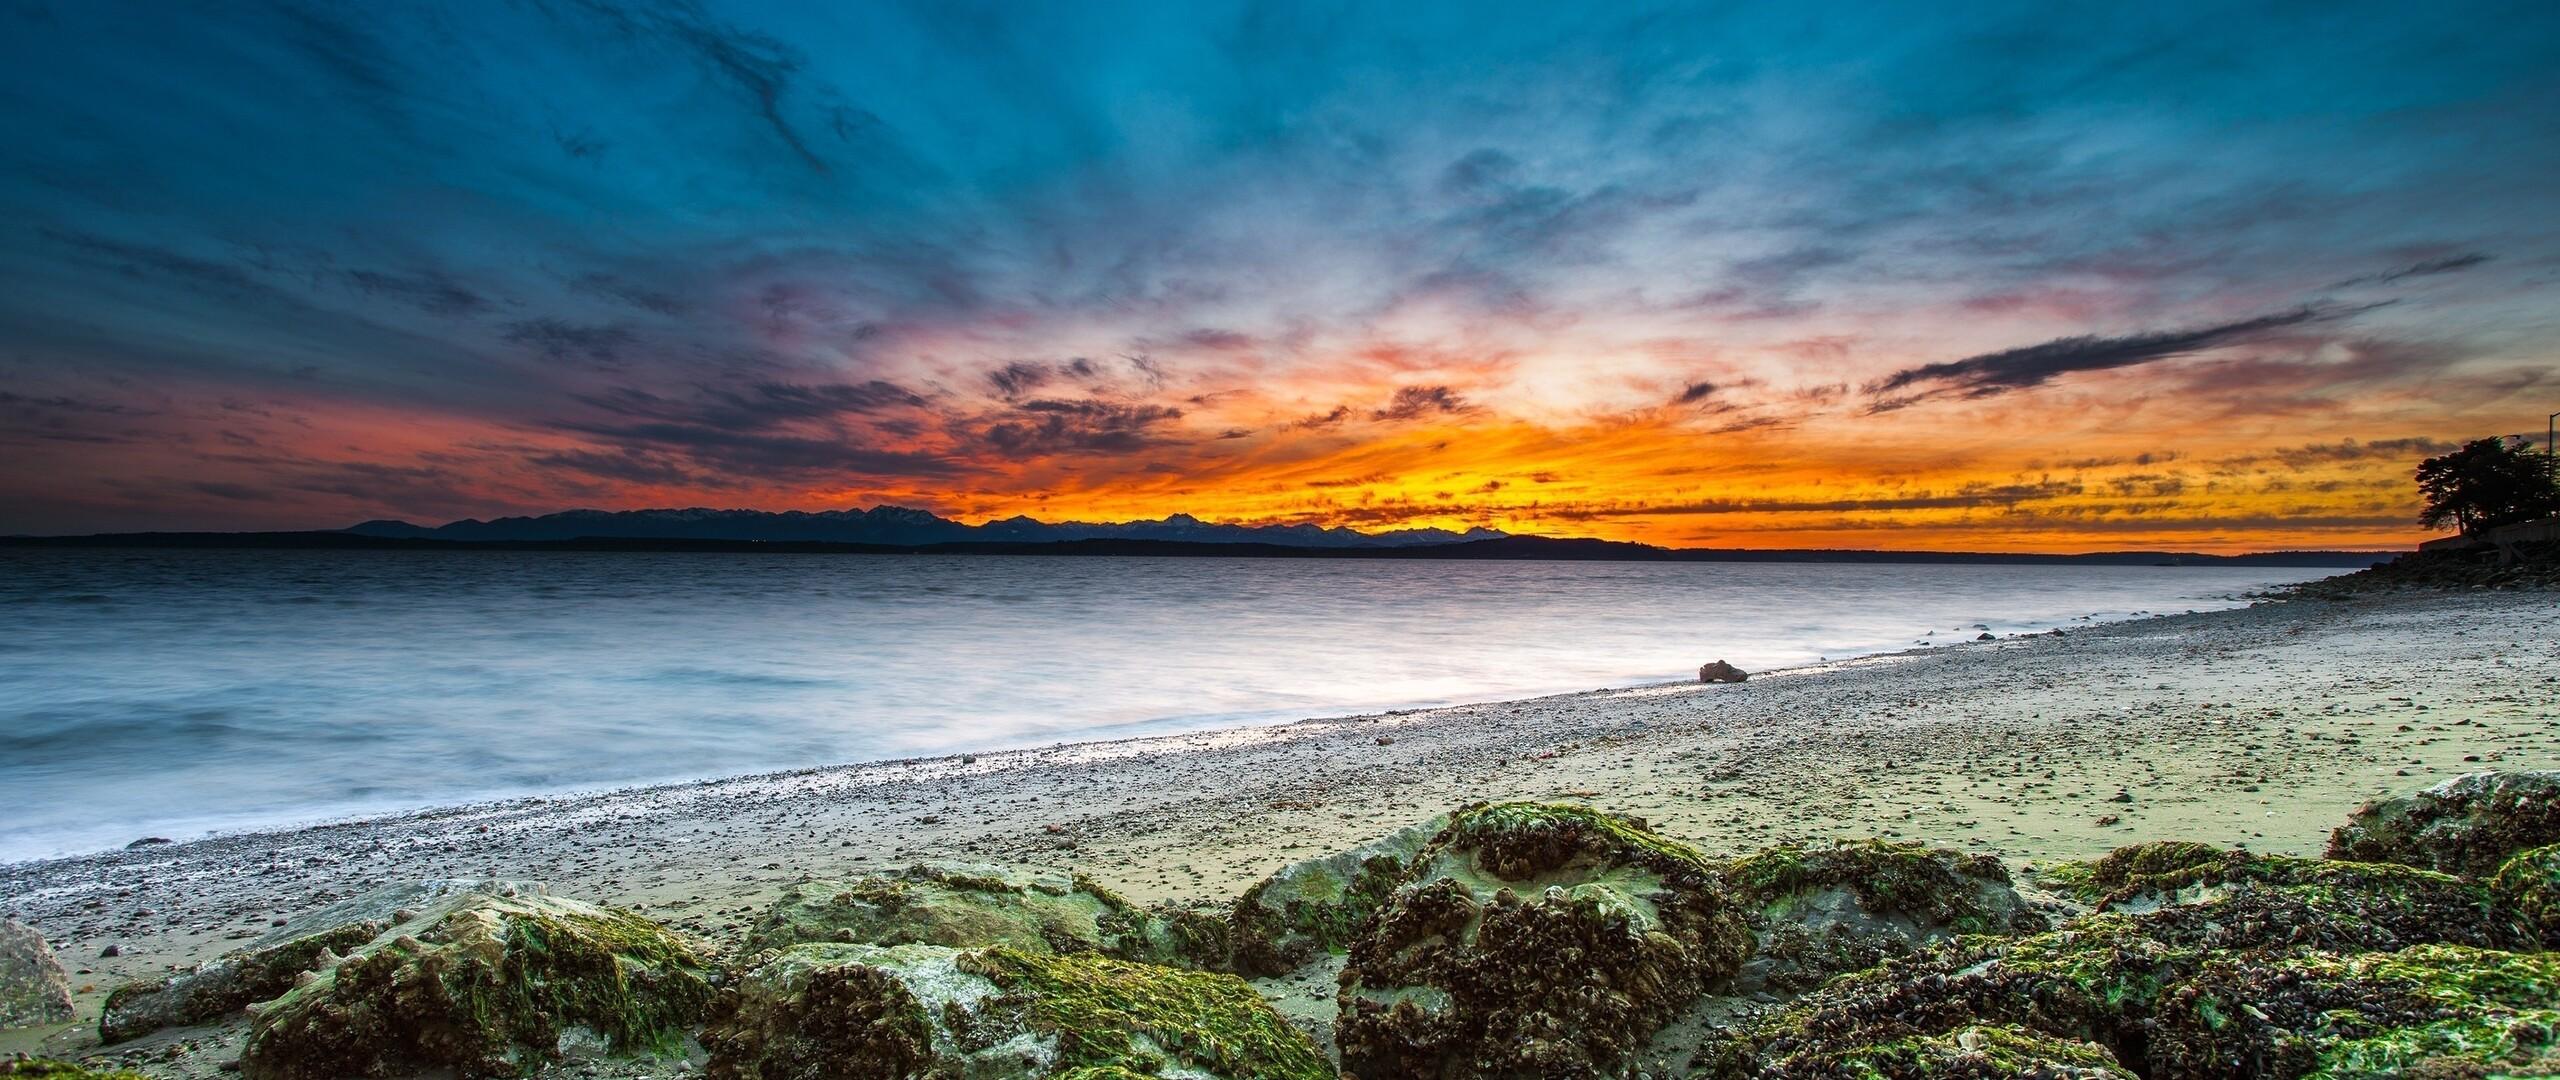 2560x1080 Beach Sky Water Background 2560x1080 Resolution ...